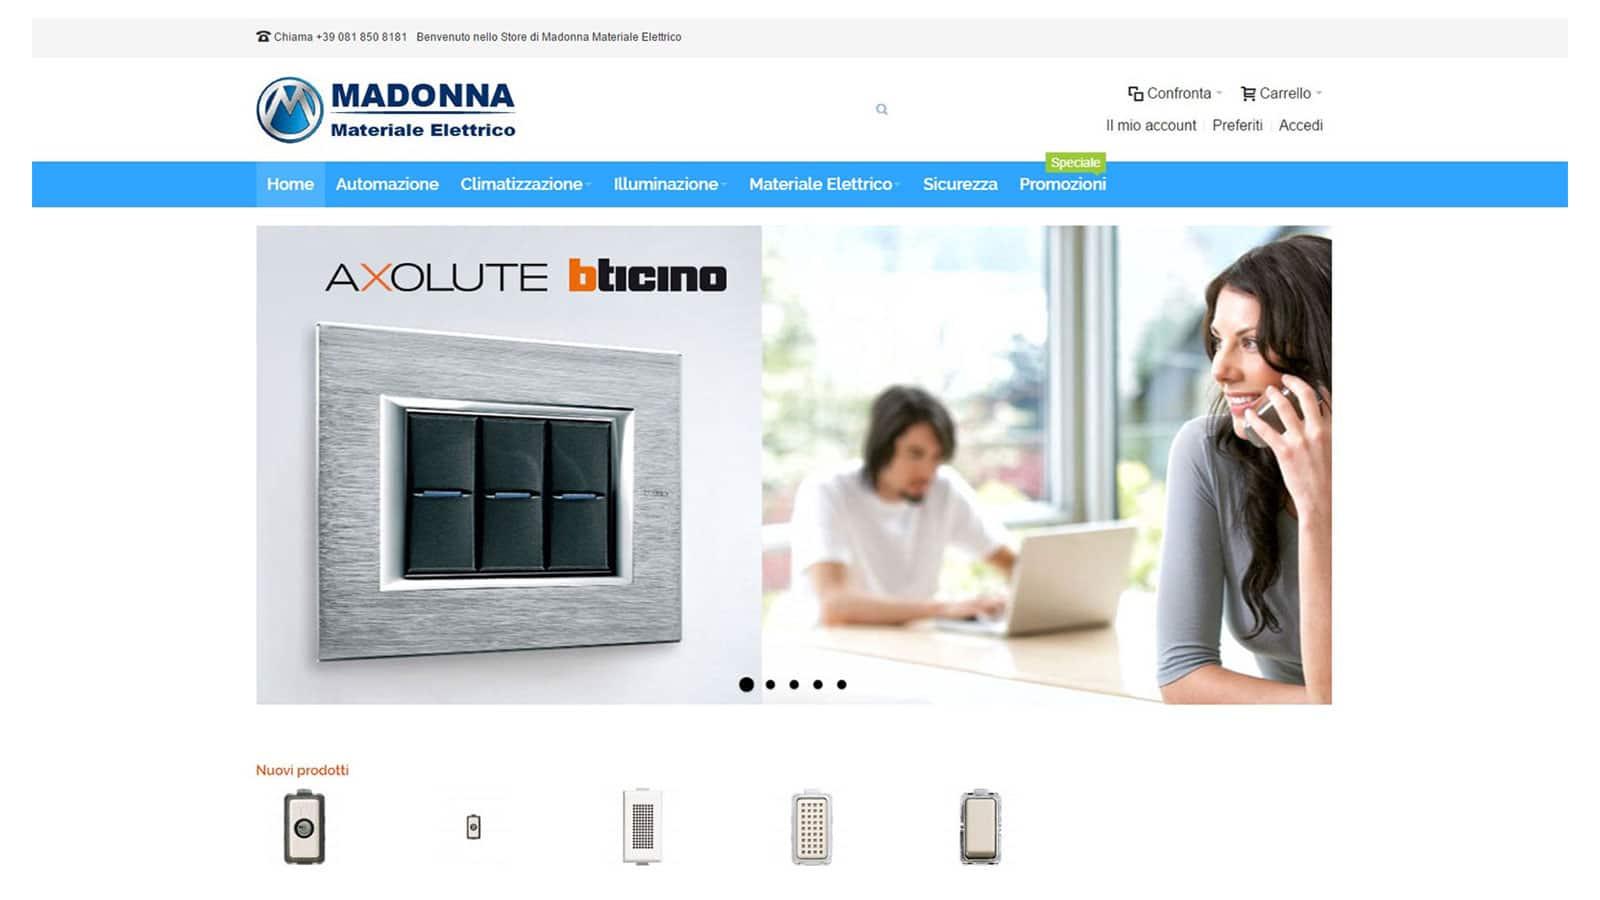 www.madonnastore.it